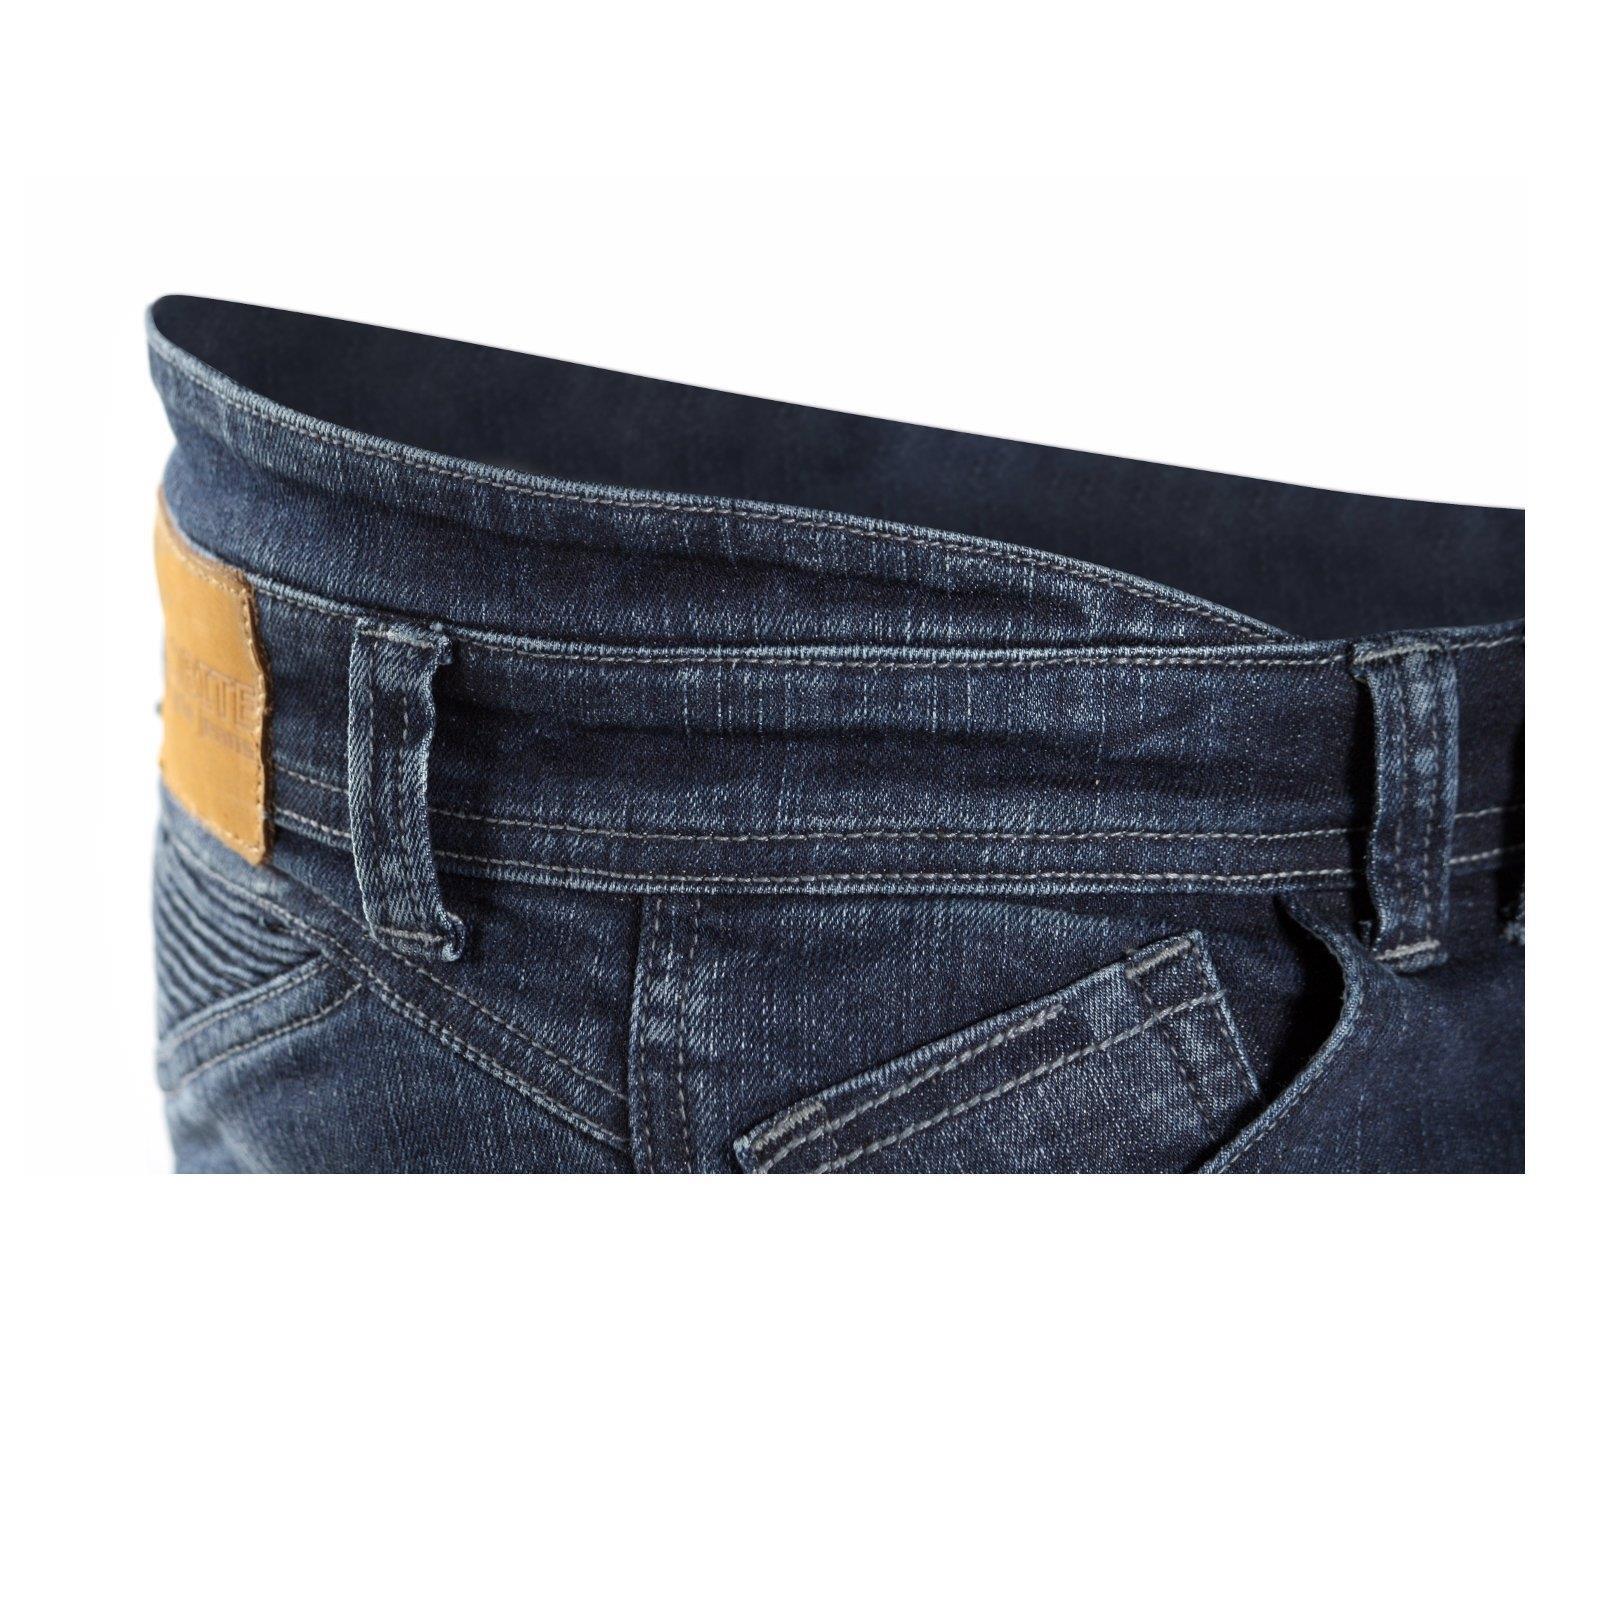 Trilobite-Pantaloni-Moto-Jeans-Abbigliamento-Parado-MICAS-URBAN-DUAL-PANTS-ACID miniatura 83